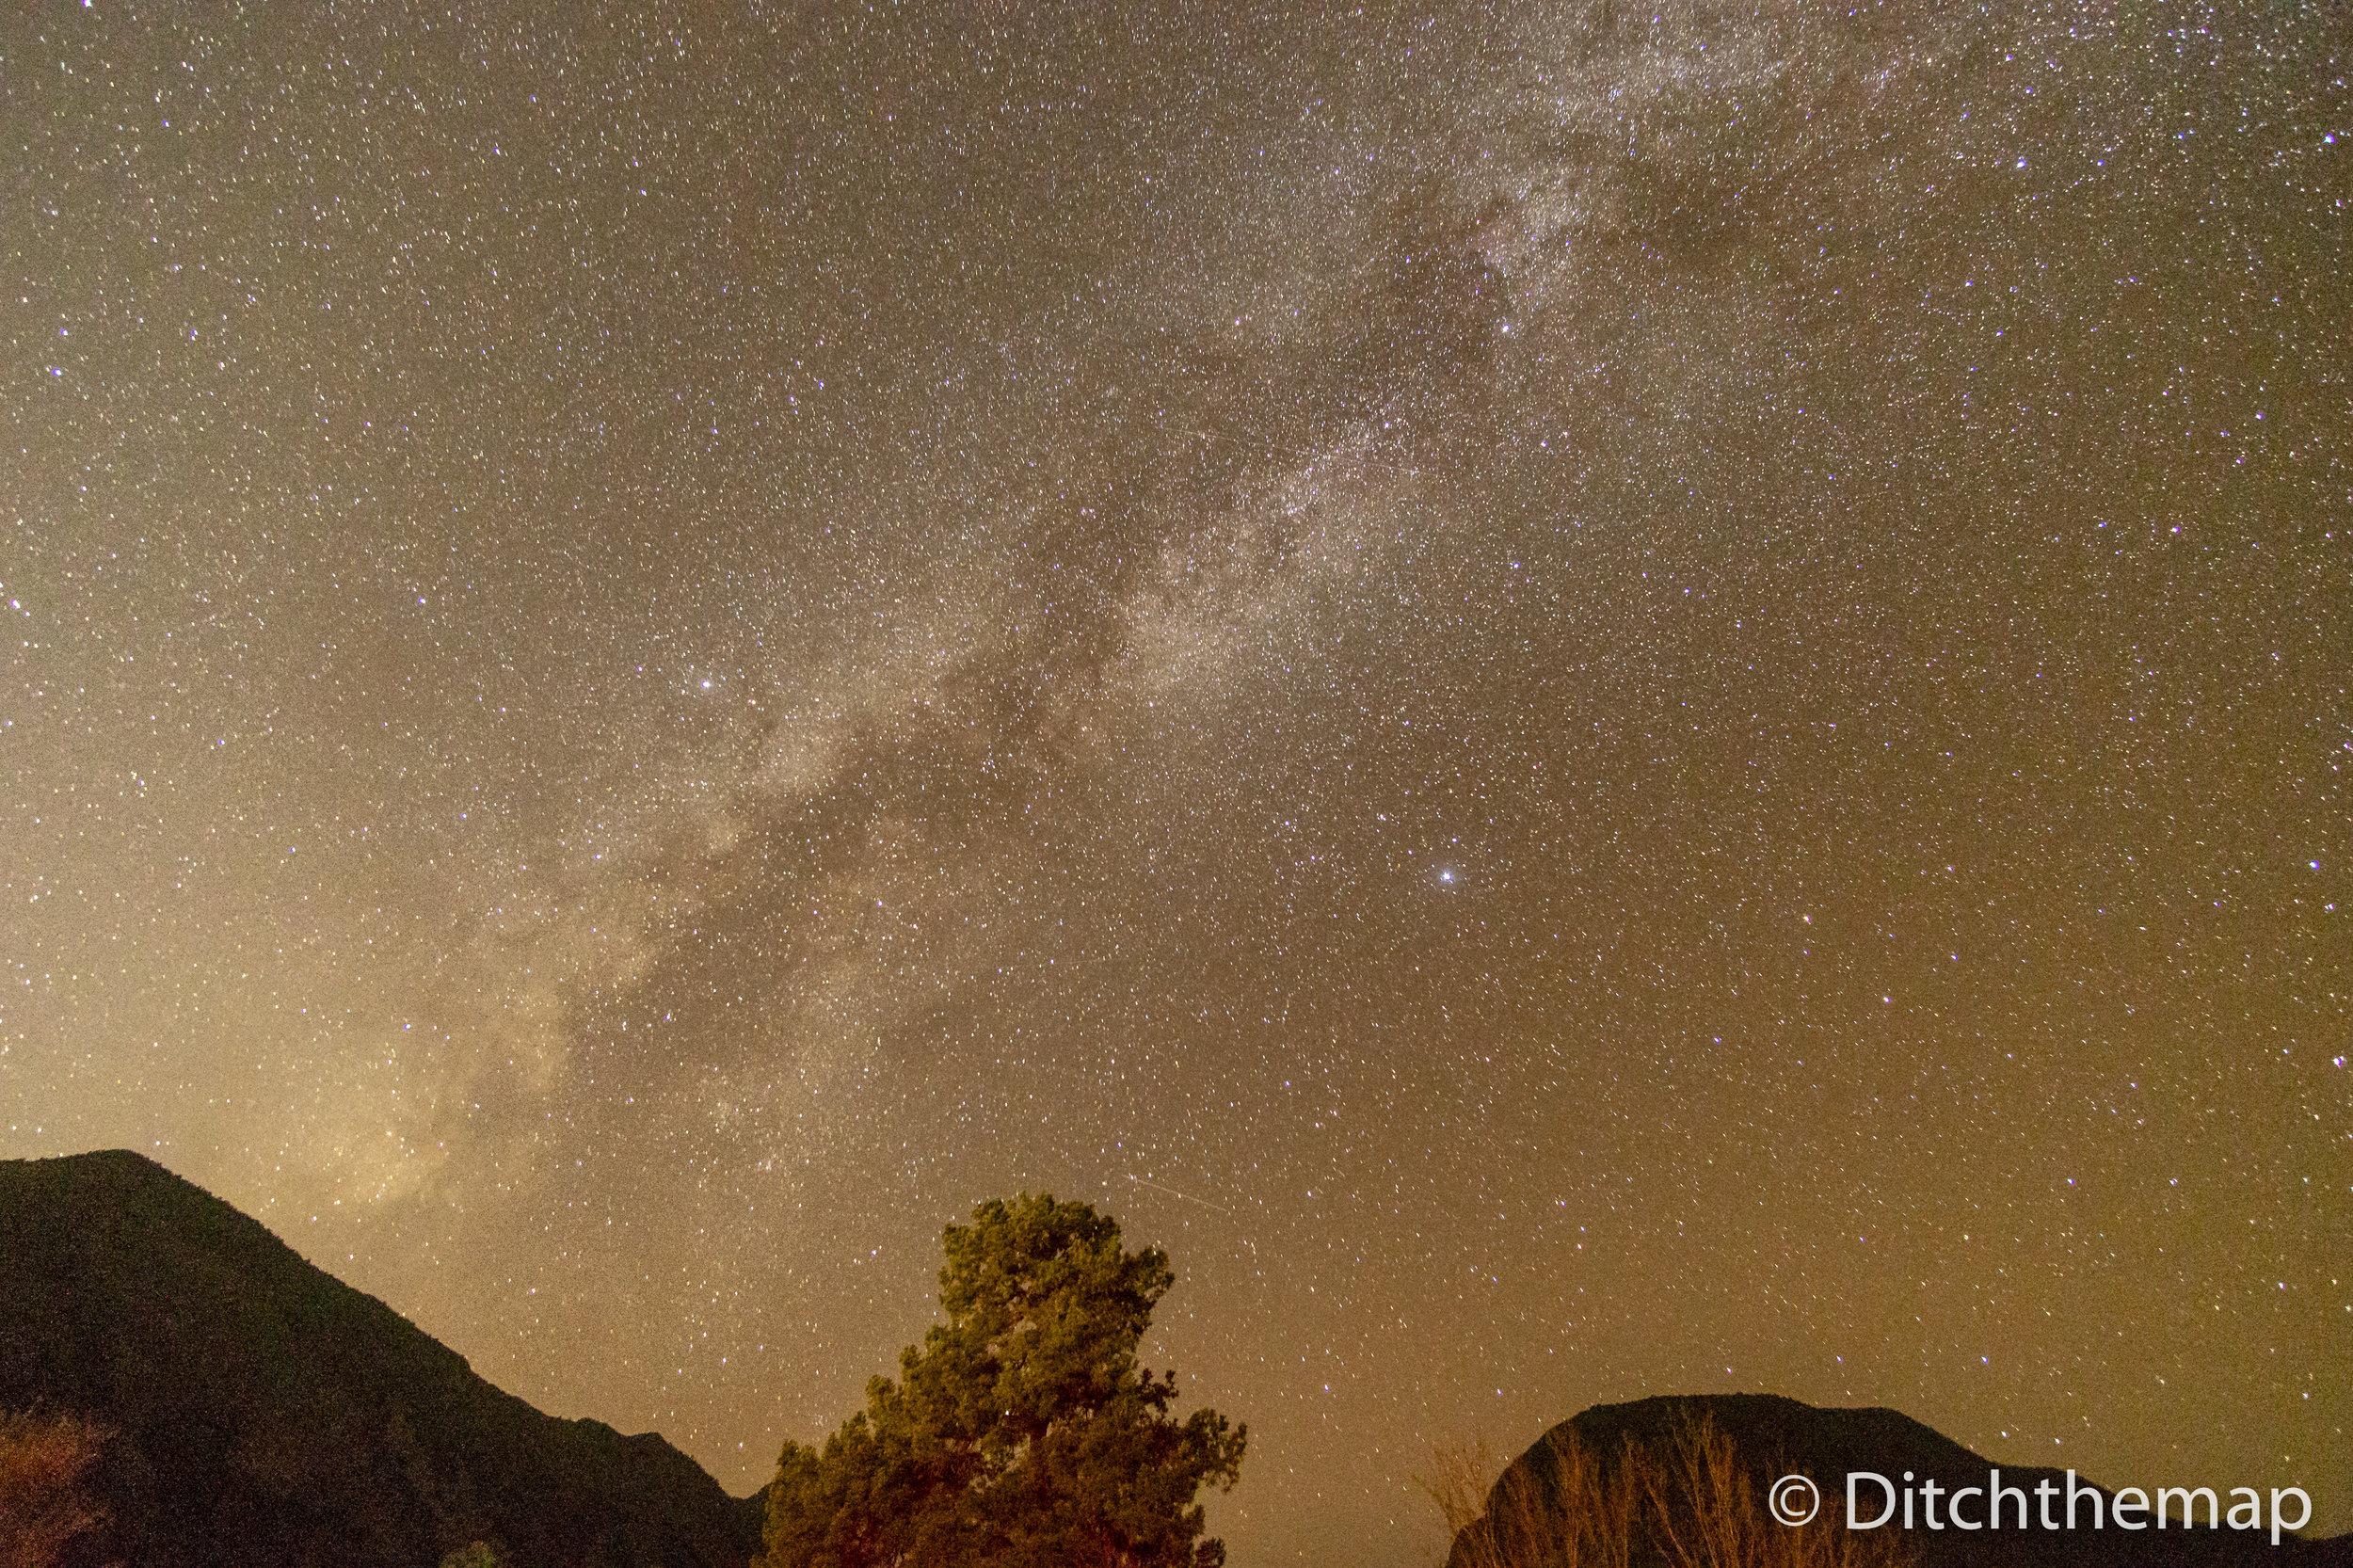 Milky Way Star Gazing in Darkest Place in the USA